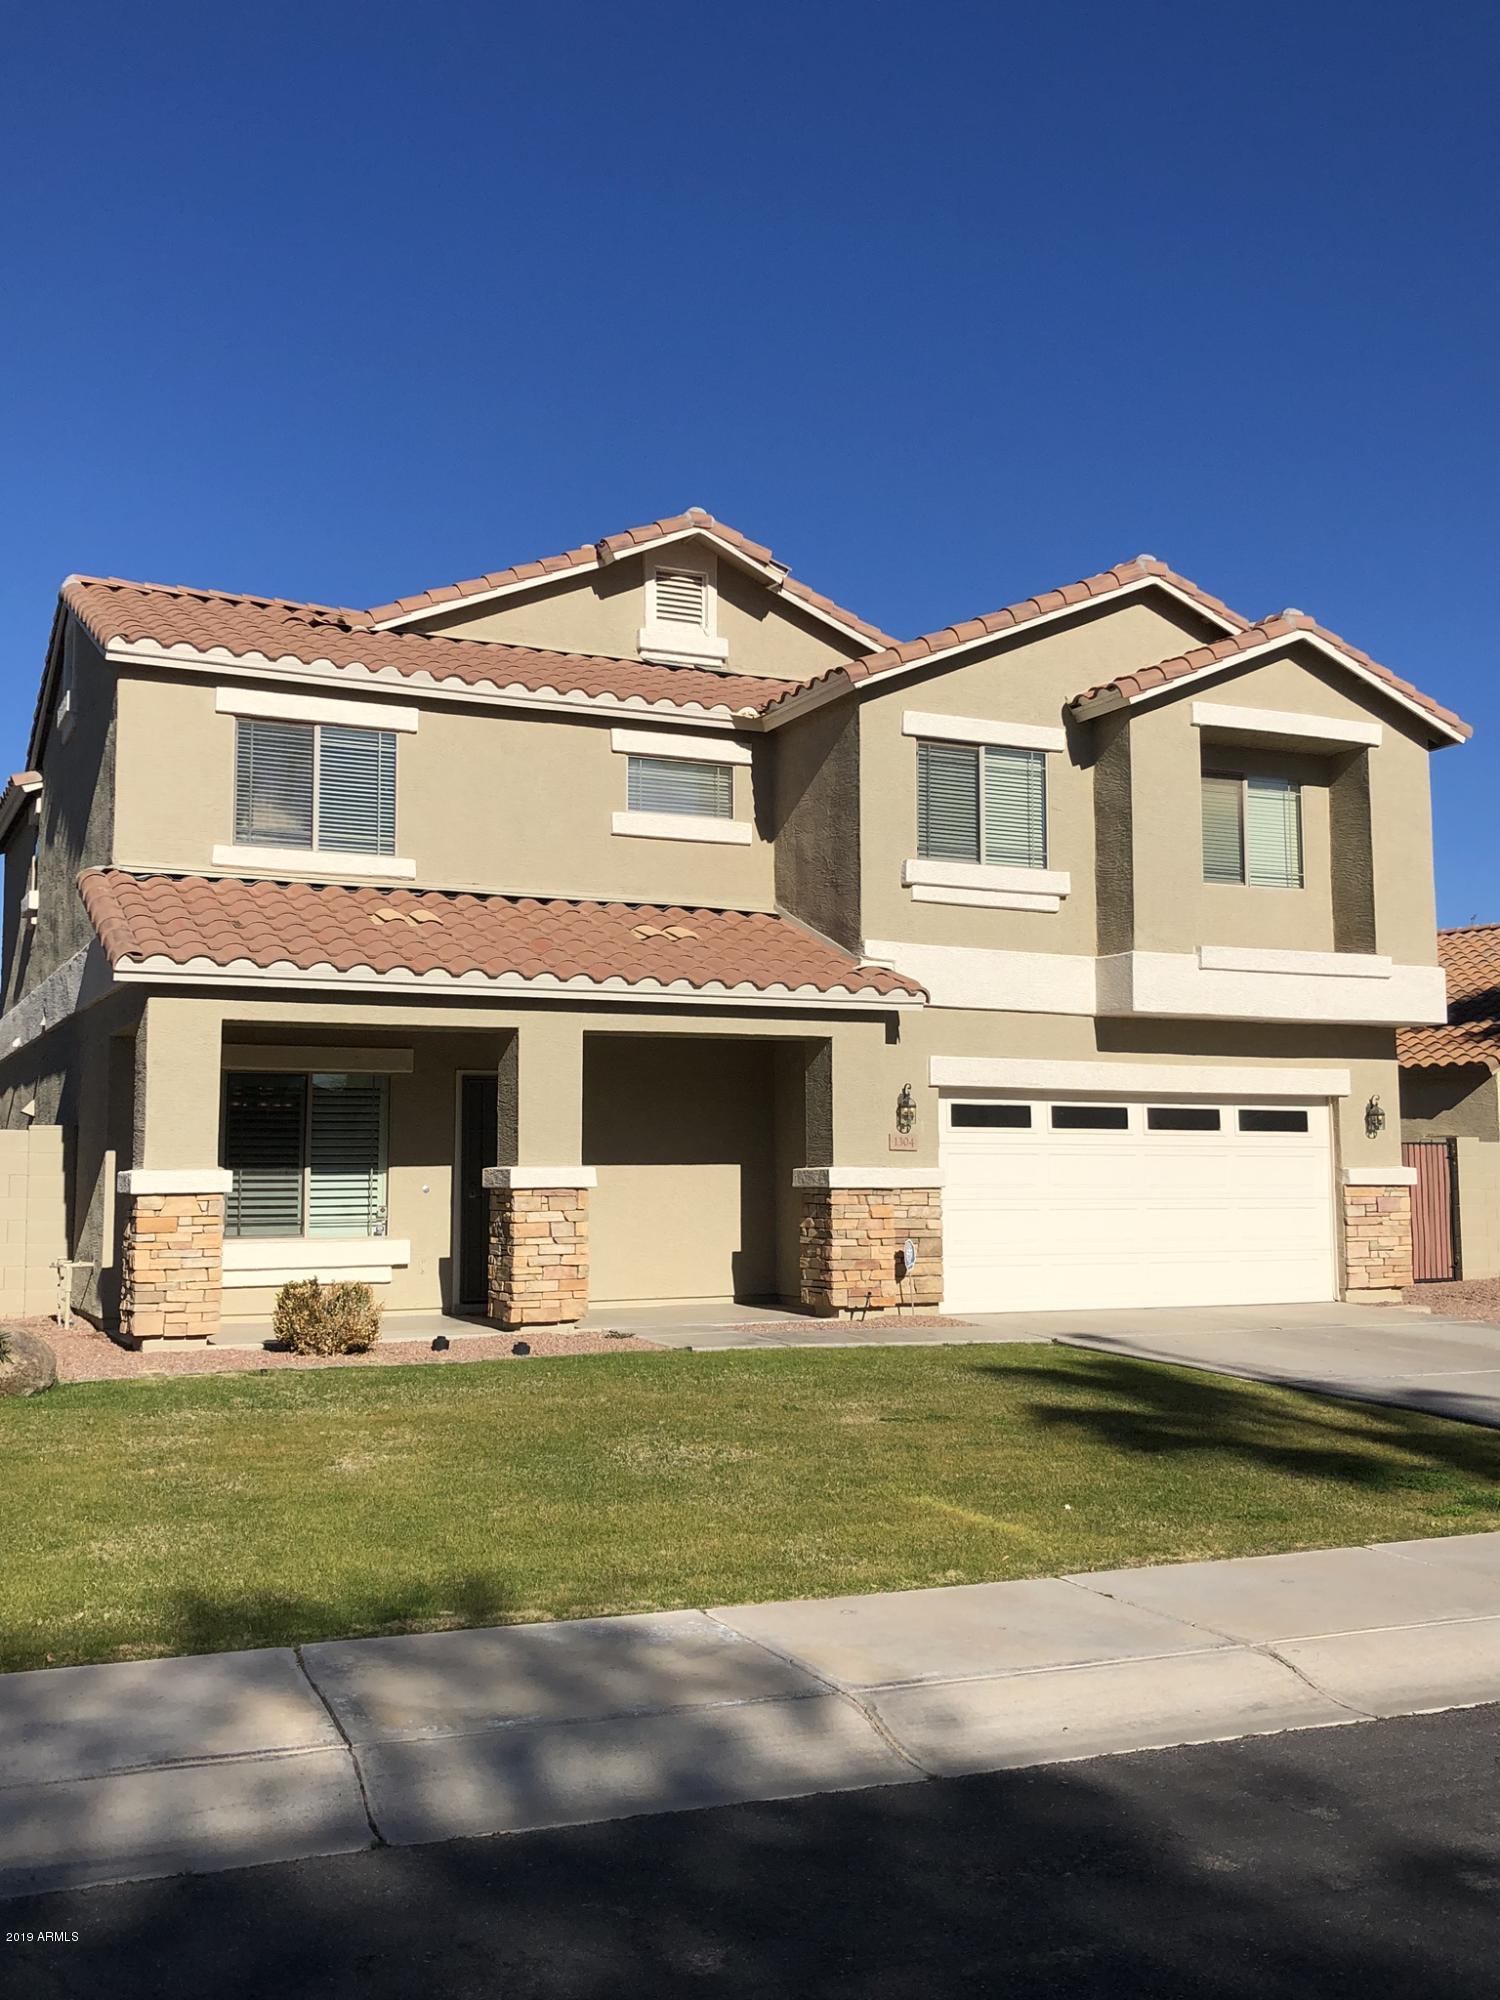 Photo of 1304 E MACAW Drive, Gilbert, AZ 85297